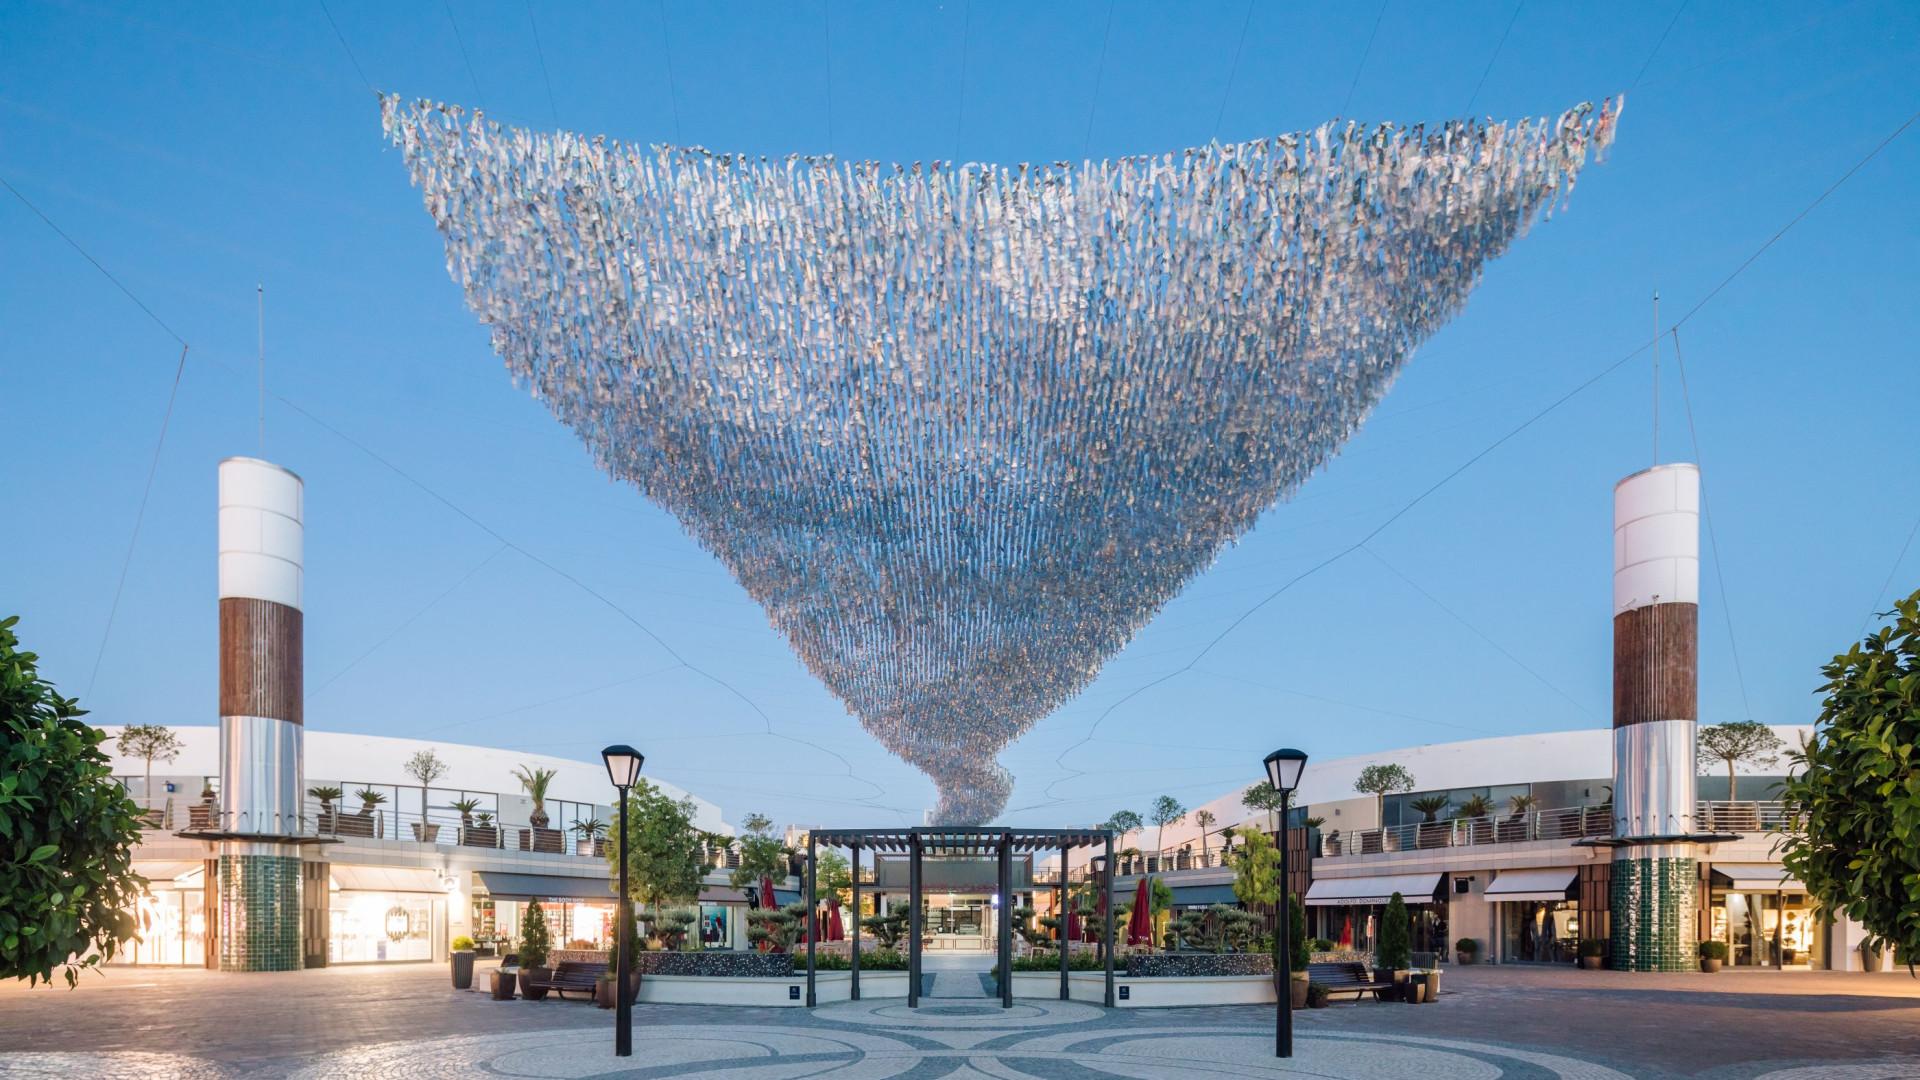 Freeport Lisboa inaugura maior escultura cinética suspensa da Europa